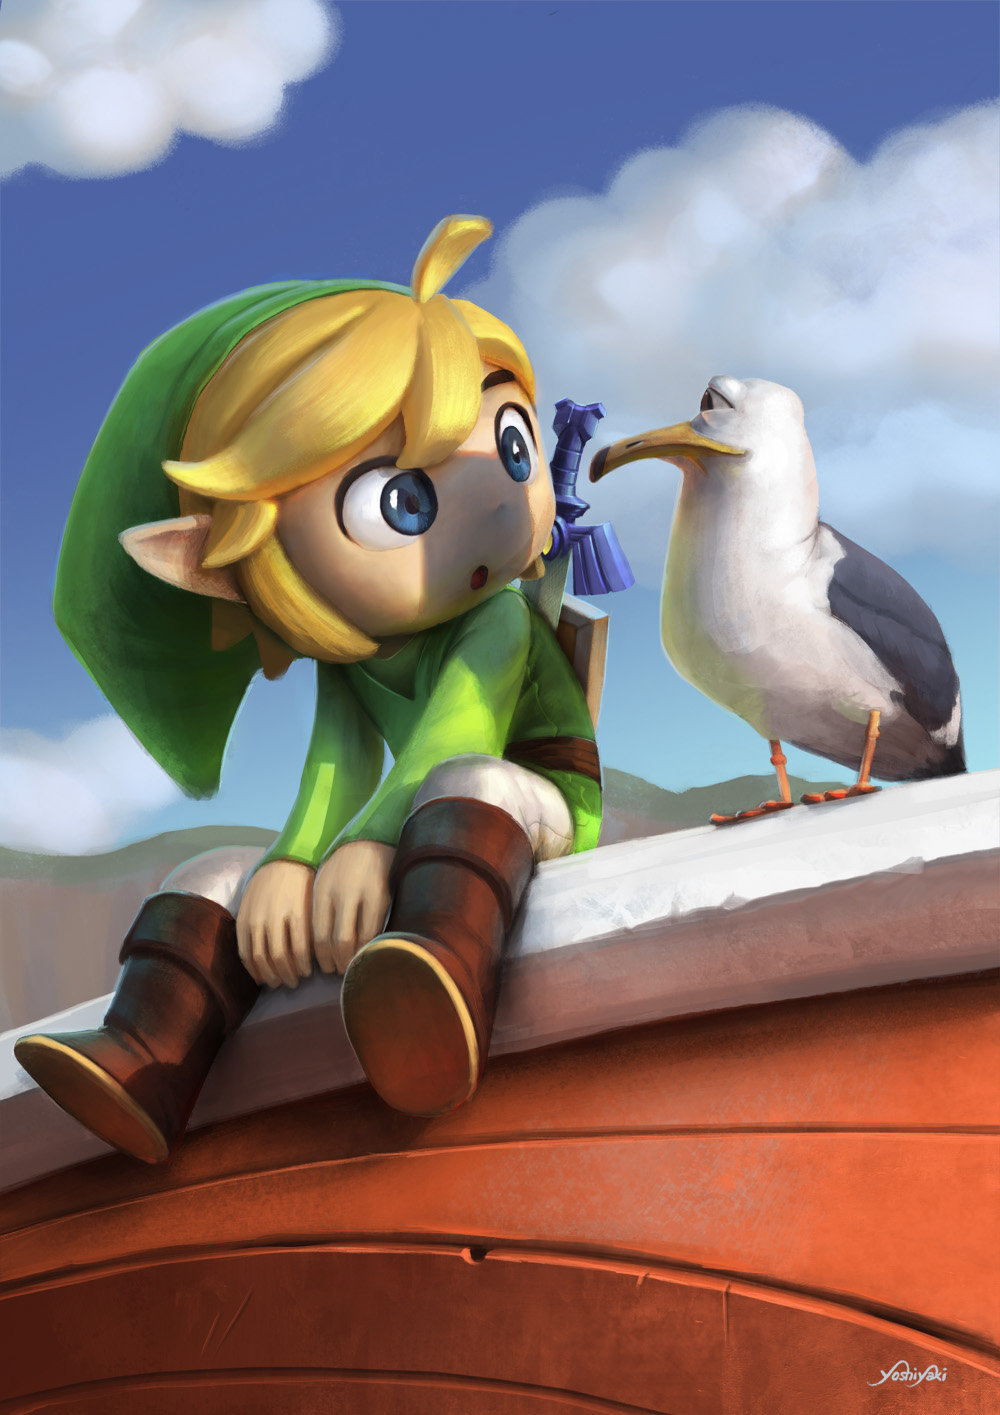 Toon Link par Cassio Yoshiyaki